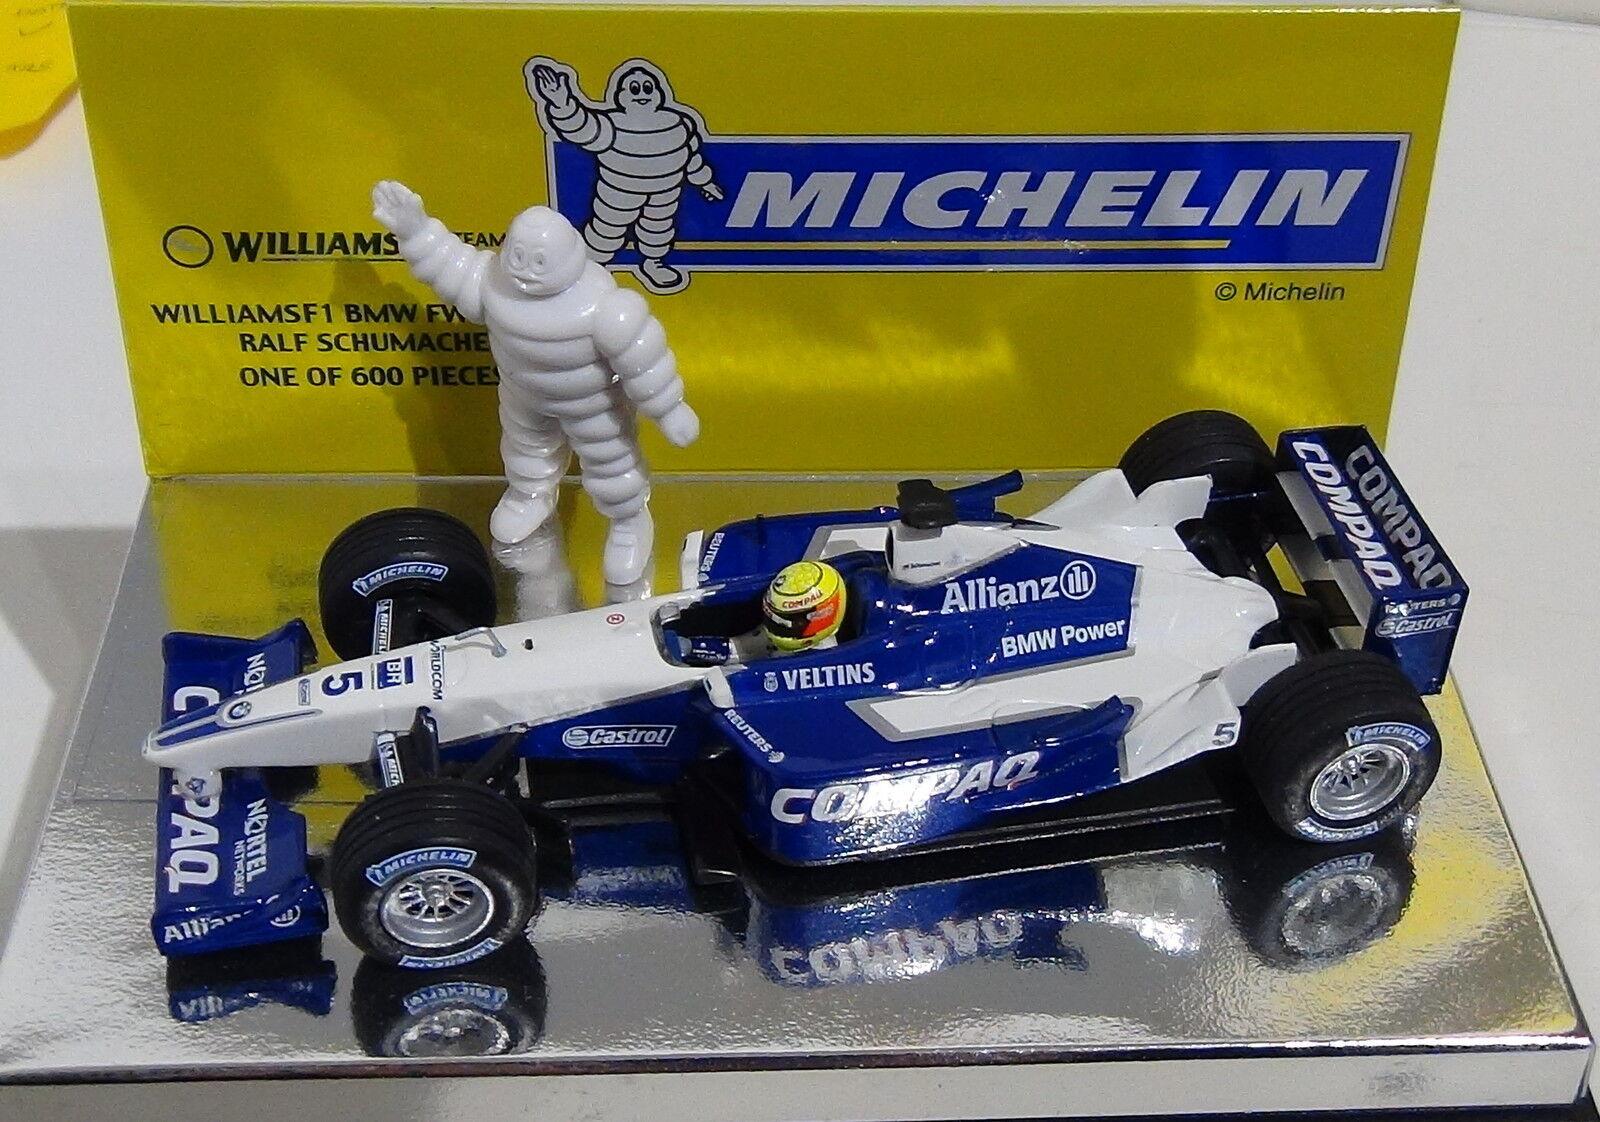 1:43 Ralf Schumacher  Williams FW23  Michelin Ltd a 600 un.